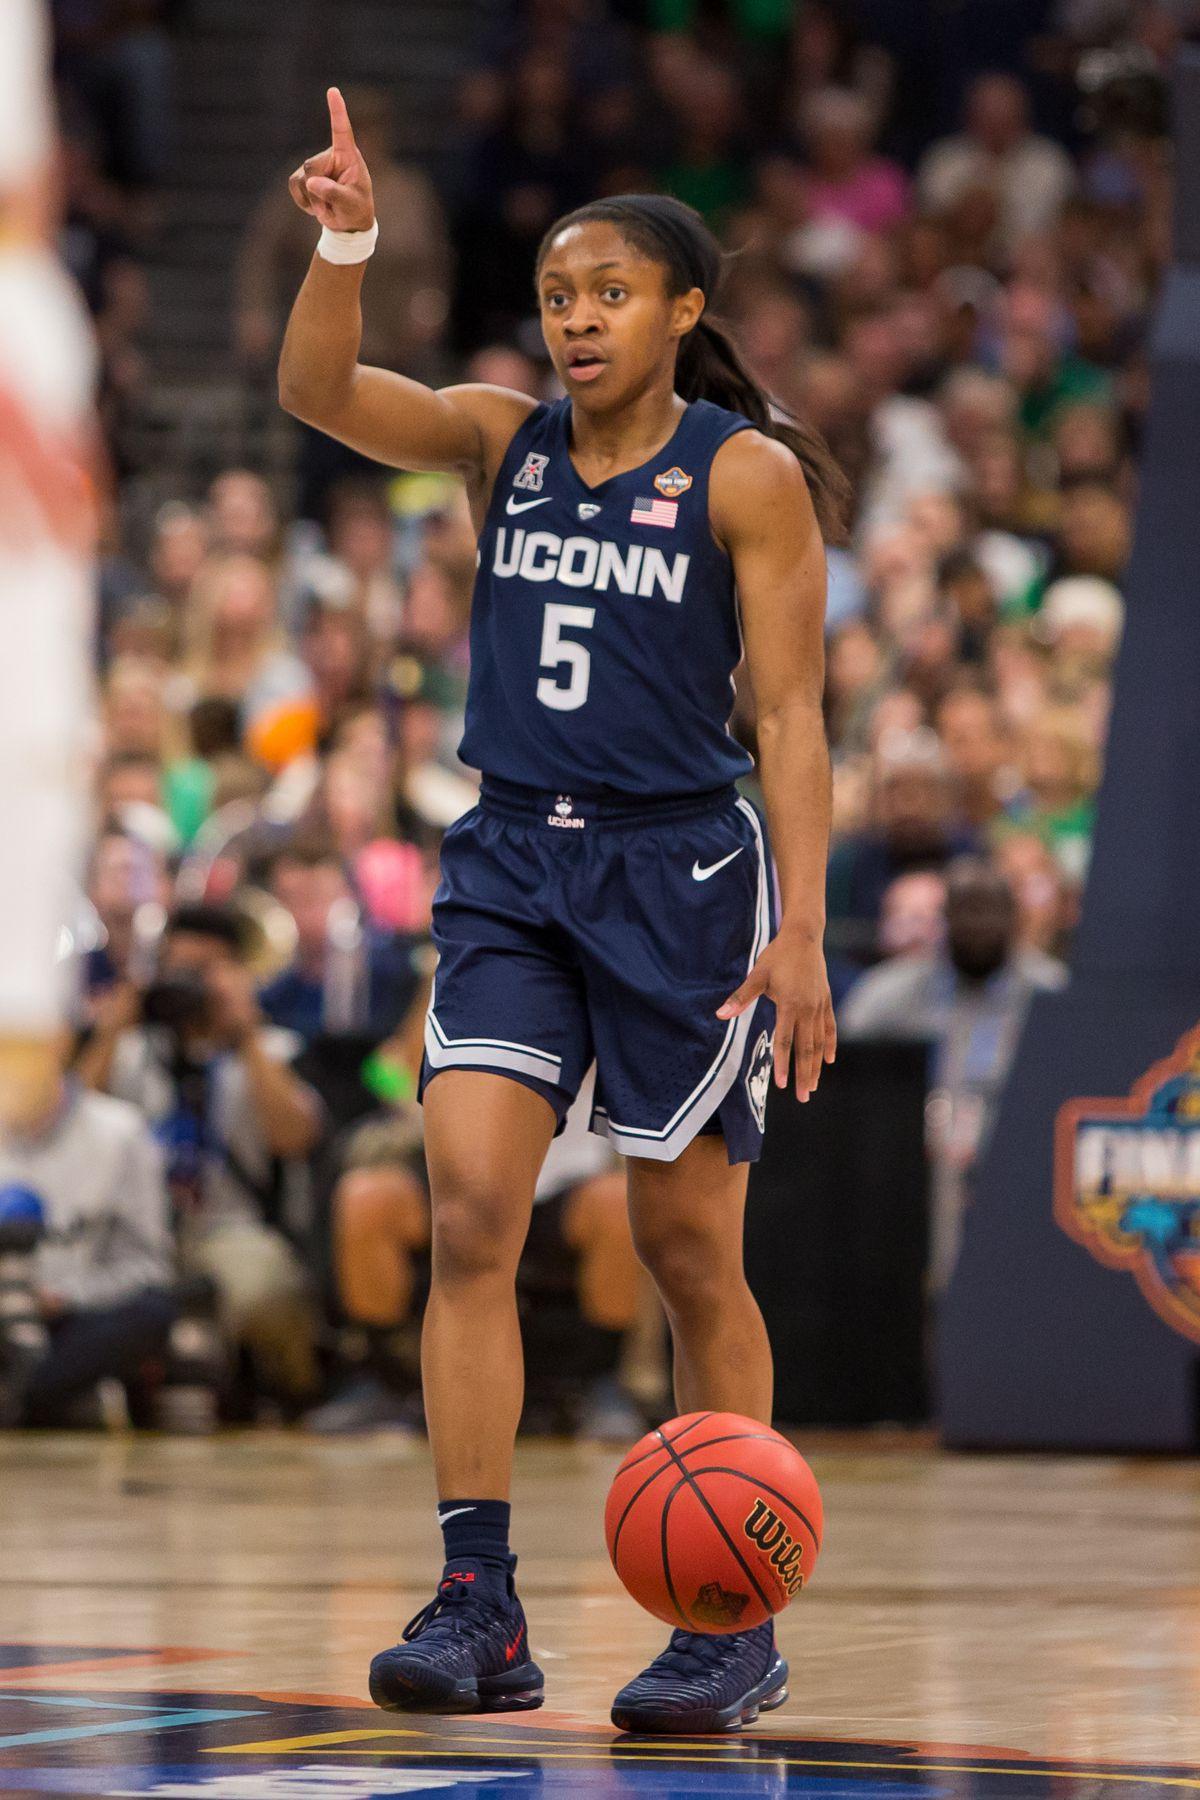 NCAA BASKETBALL: APR 05 Div I Women's Championship - Final Four - Notre Dame v UCONN